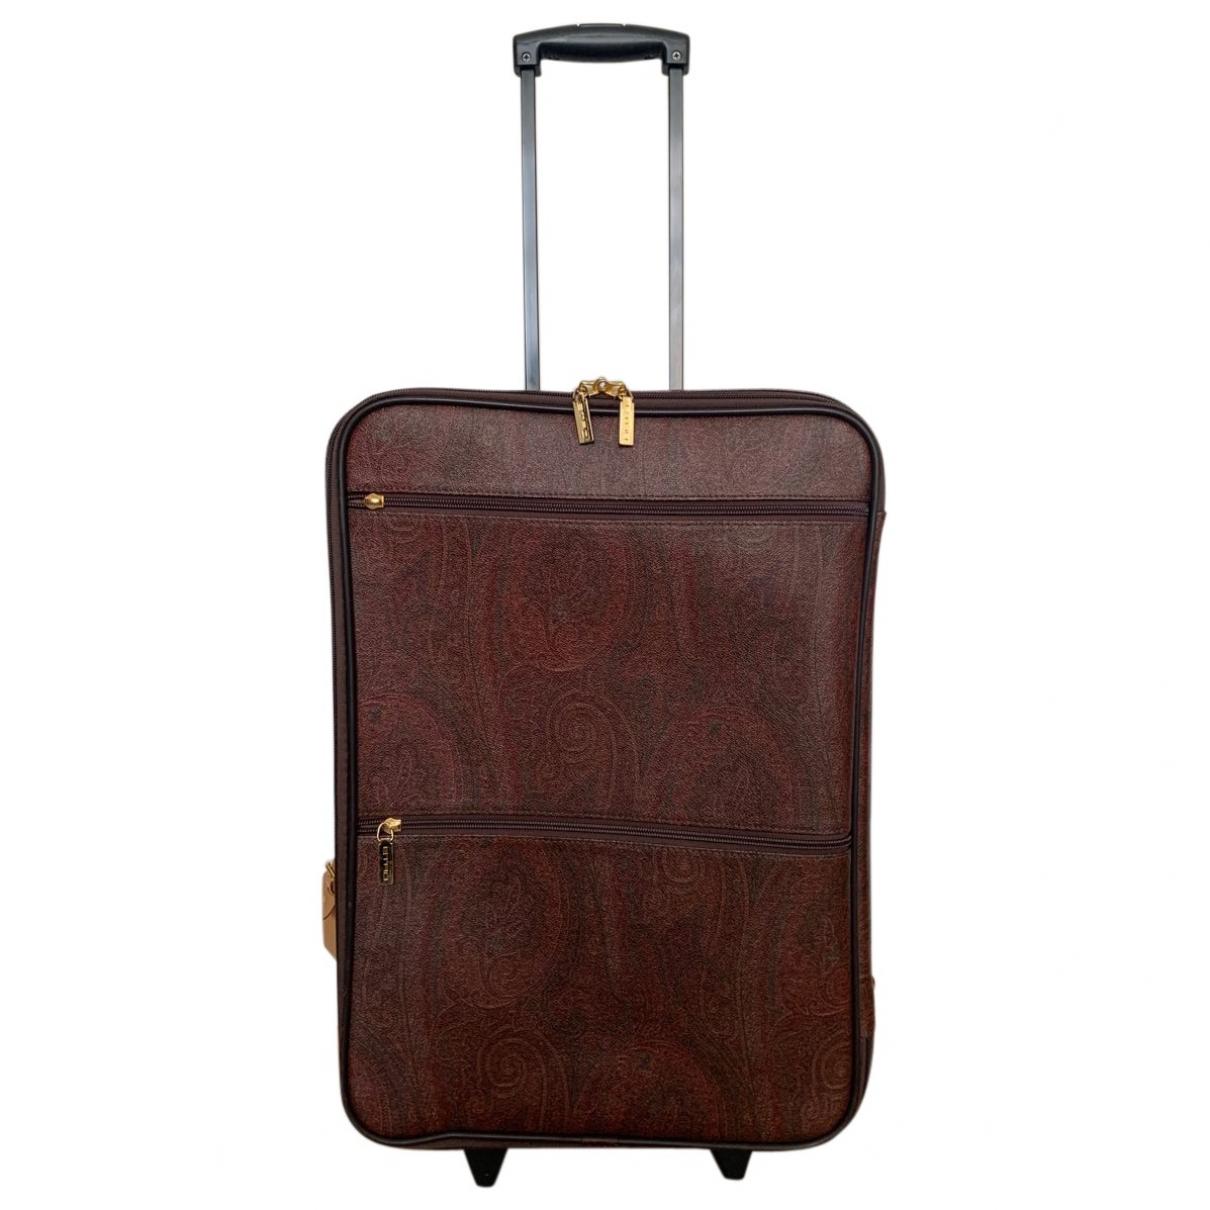 Etro \N Leather Travel bag for Women \N